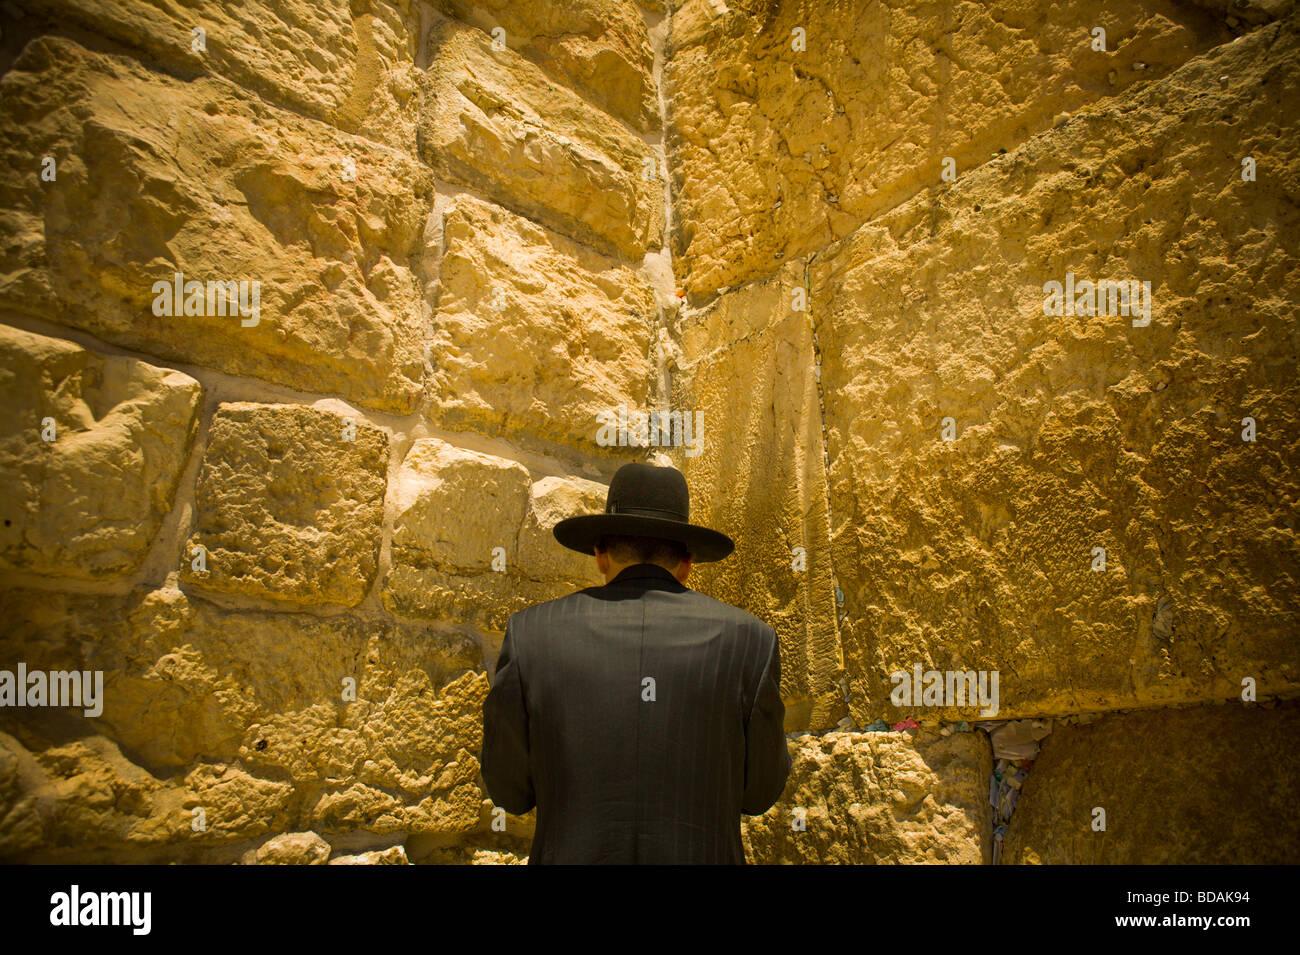 One man praying at the wailing wall in Jerusalem Stock Photo